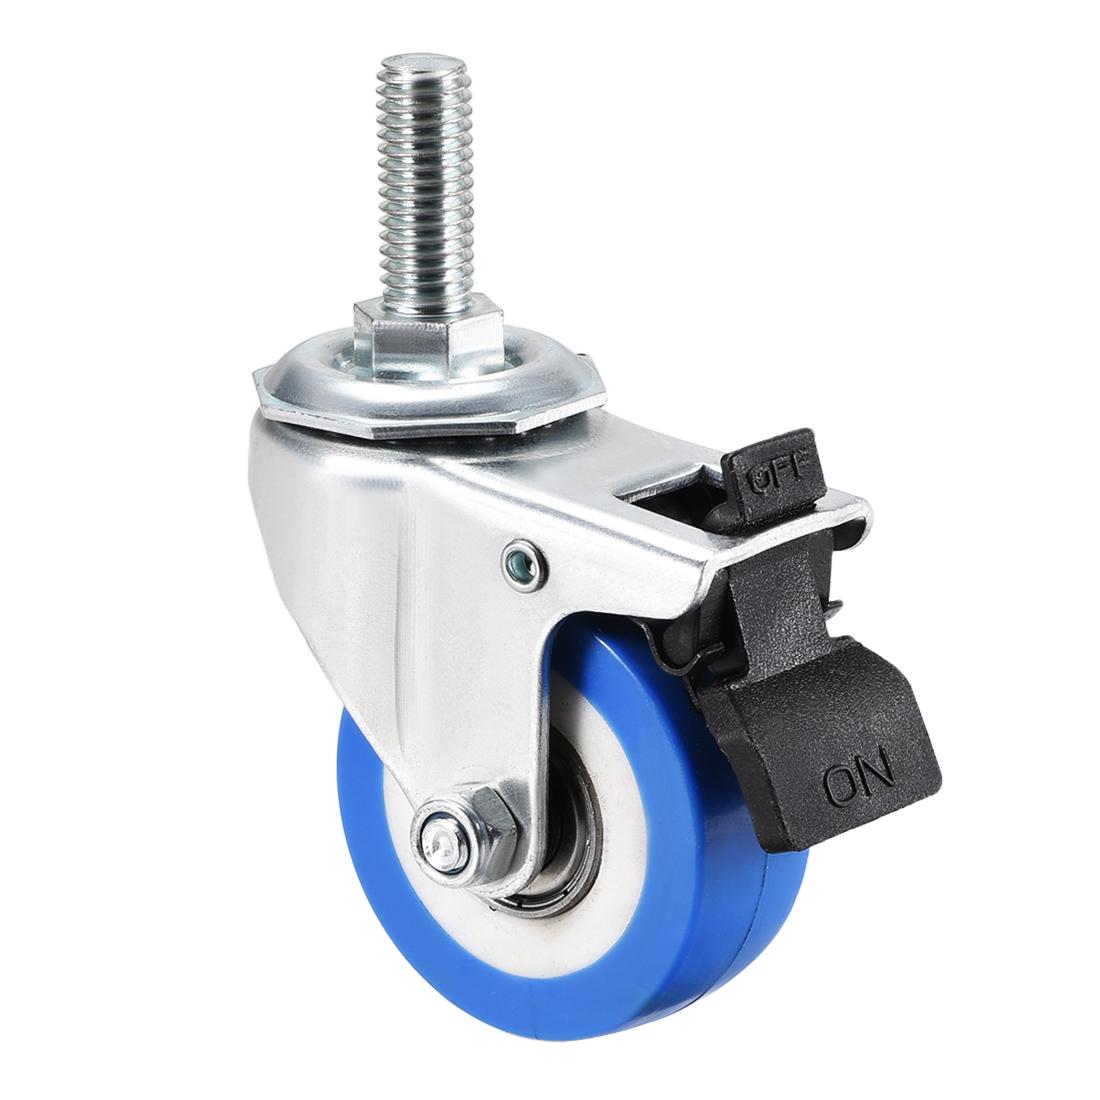 Swivel Caster Wheels PU Caster 2 Inch Wheel M10 x 25mm Threaded Stem with Brake